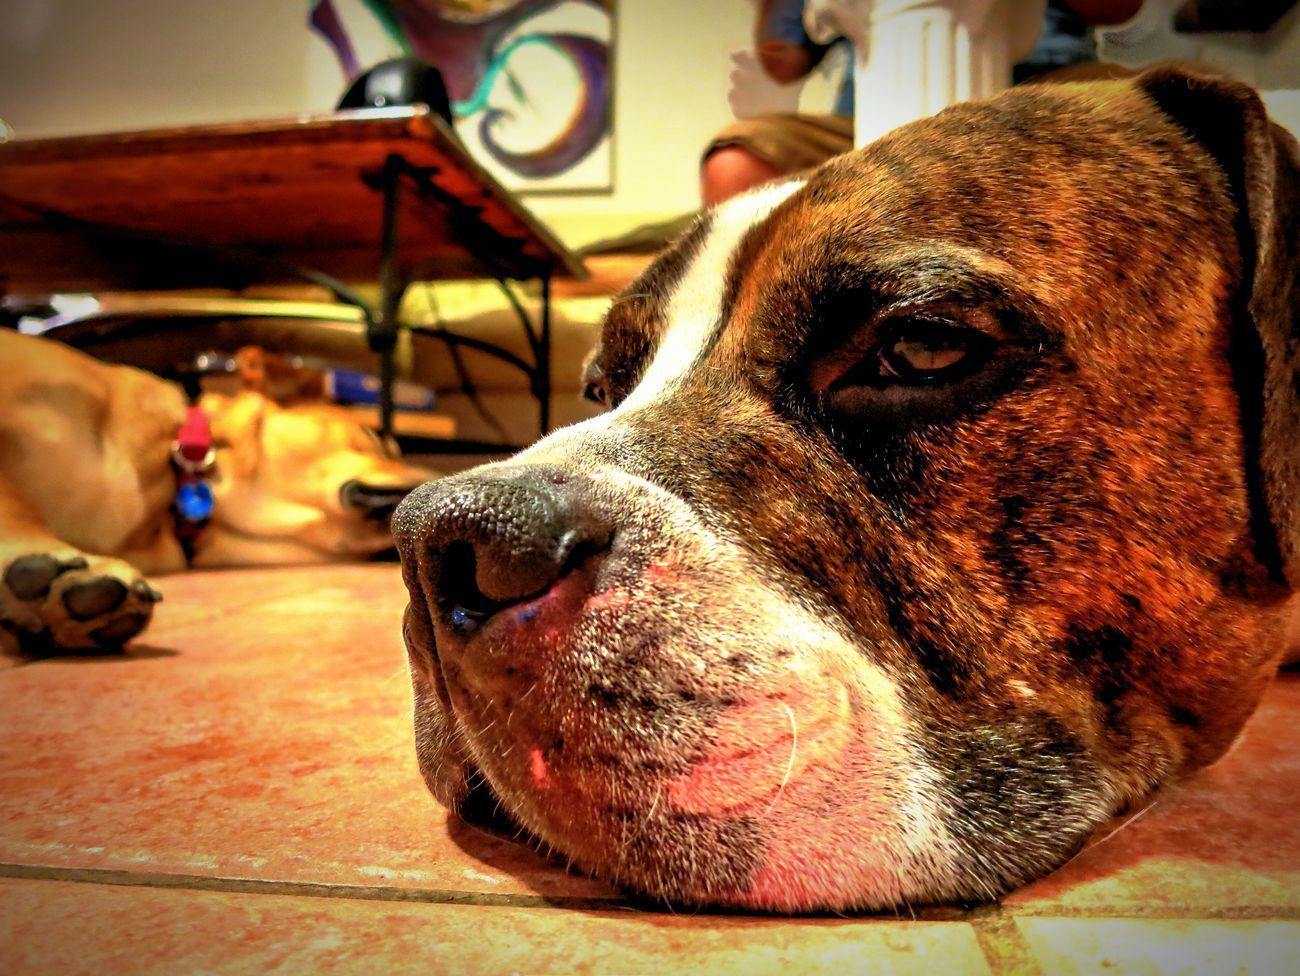 Everyday Joy Dogs Pitbulls Cute Pets Cute Sleeping Buster Sleepyhead Pets